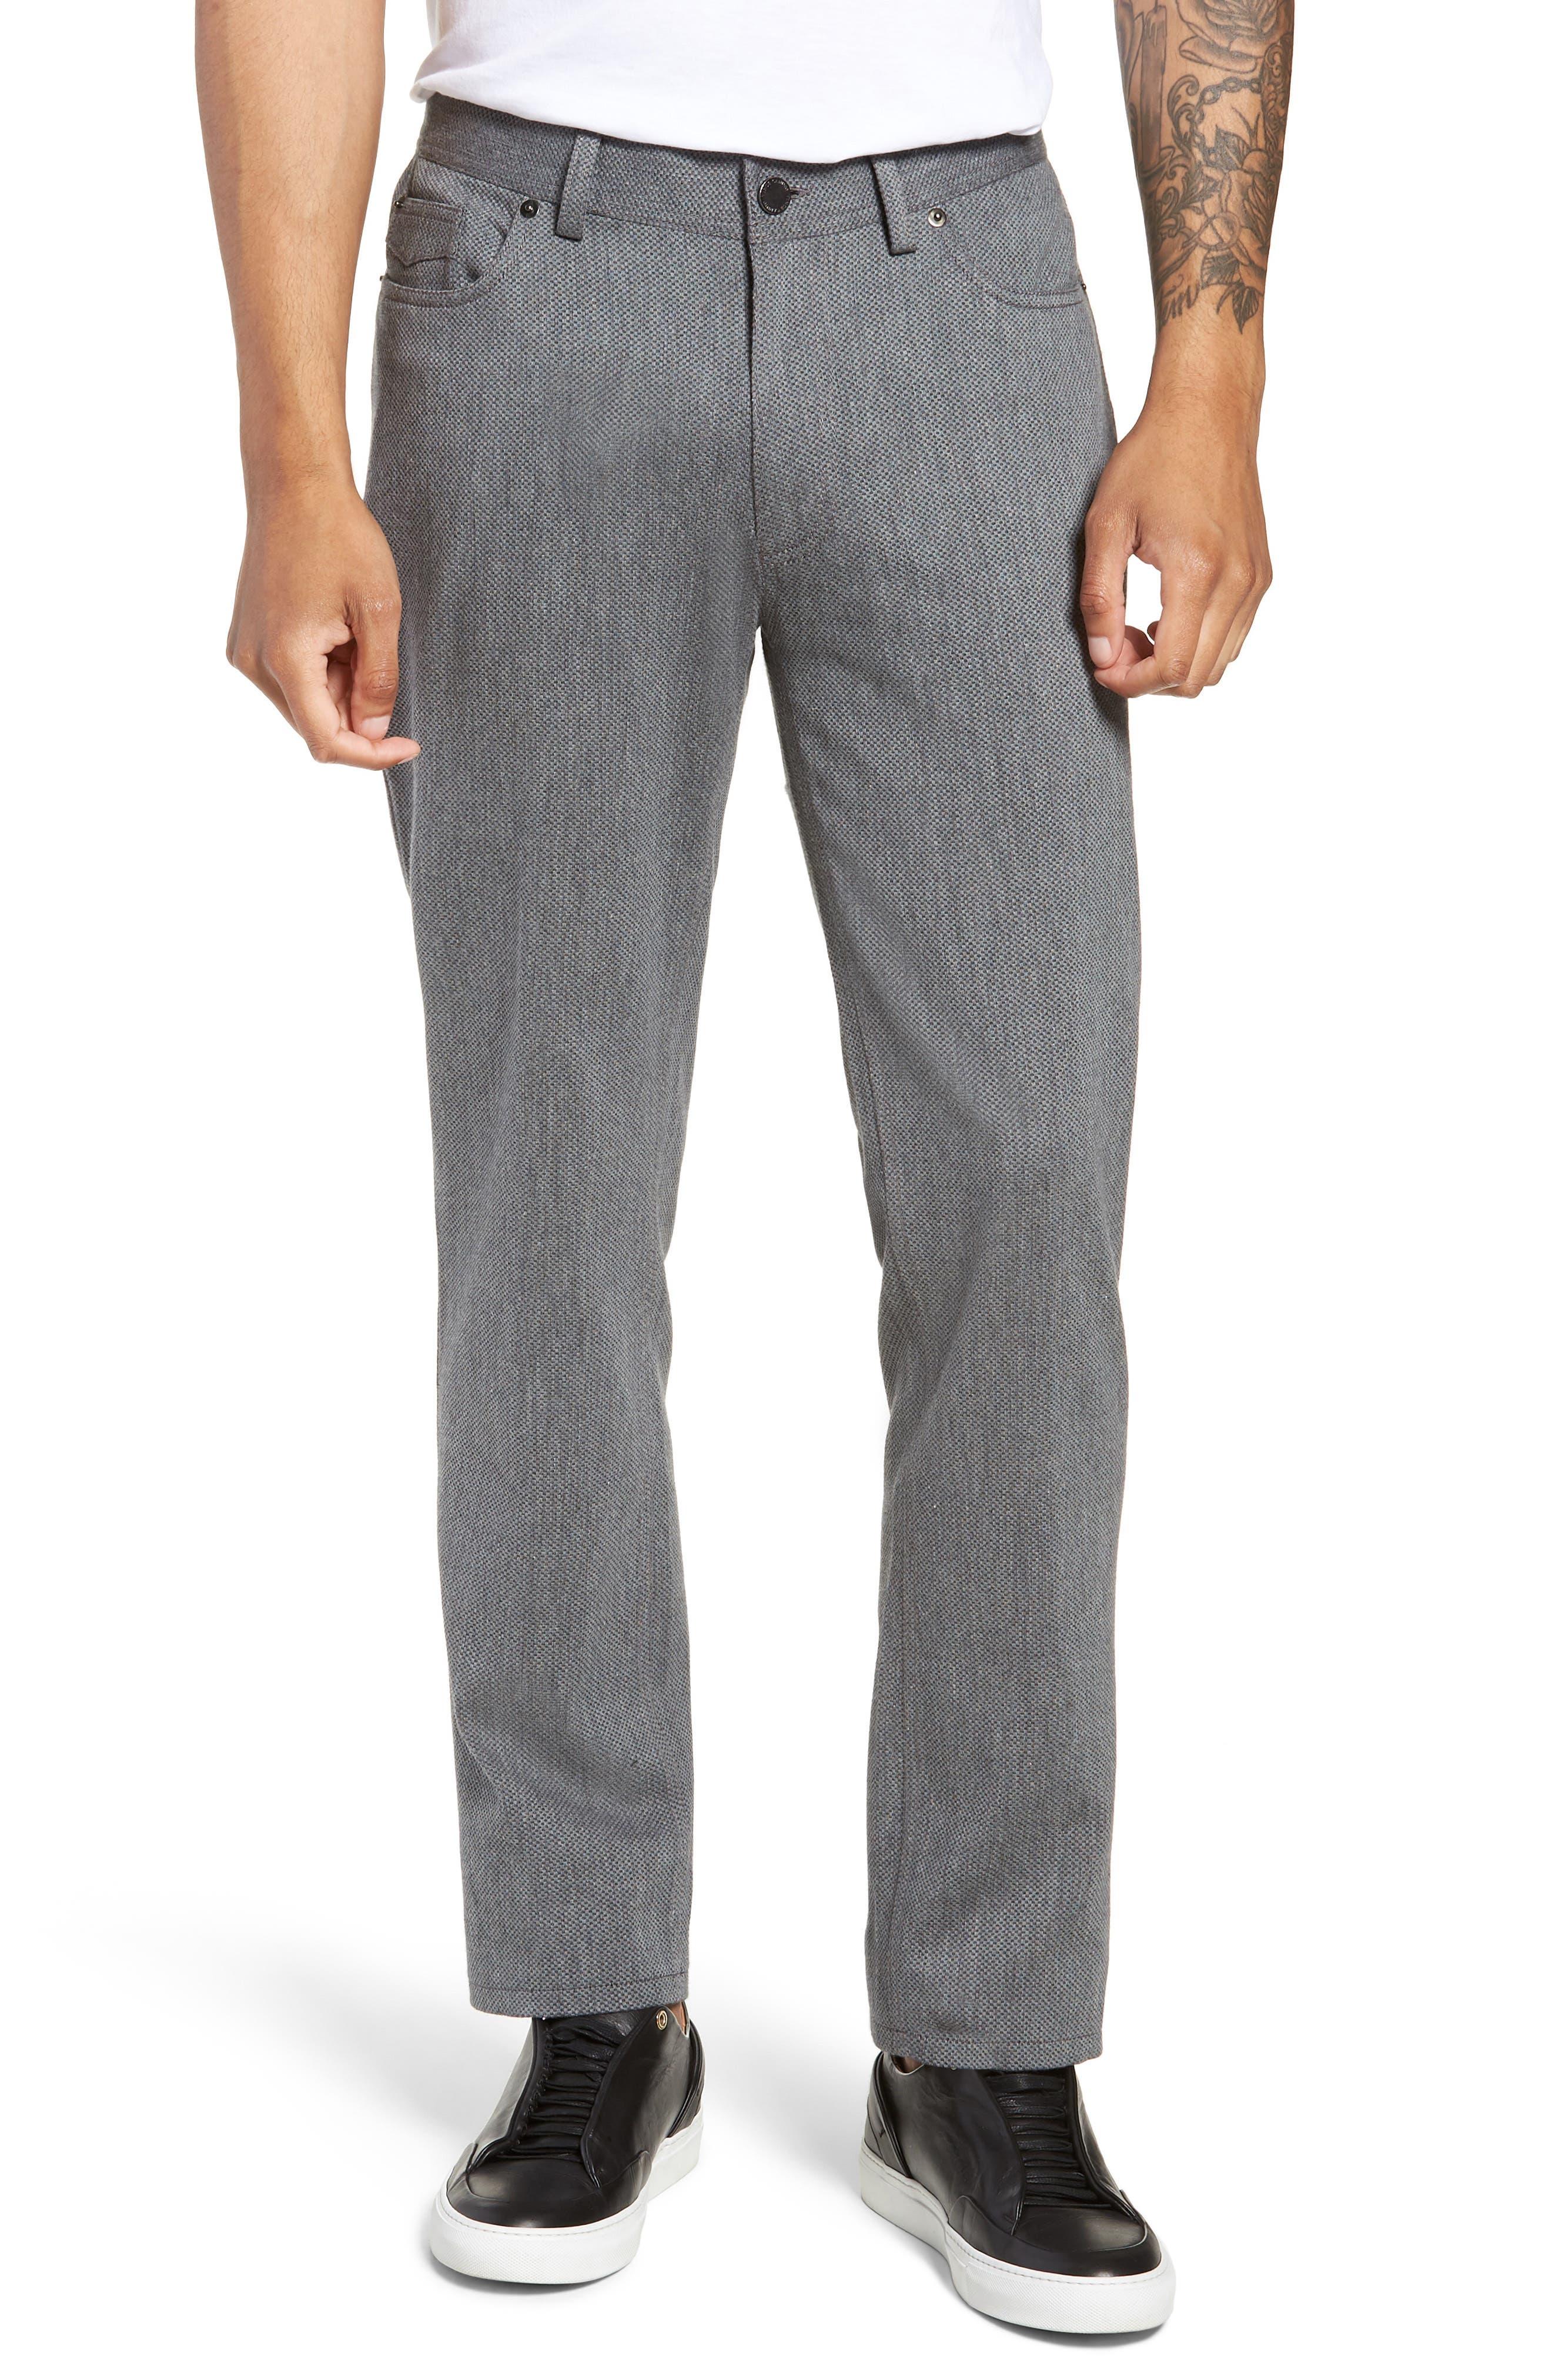 Straight Leg Five Pocket Stretch Pants, Main, color, HEATHER CHARCOAL CROSSHATCH